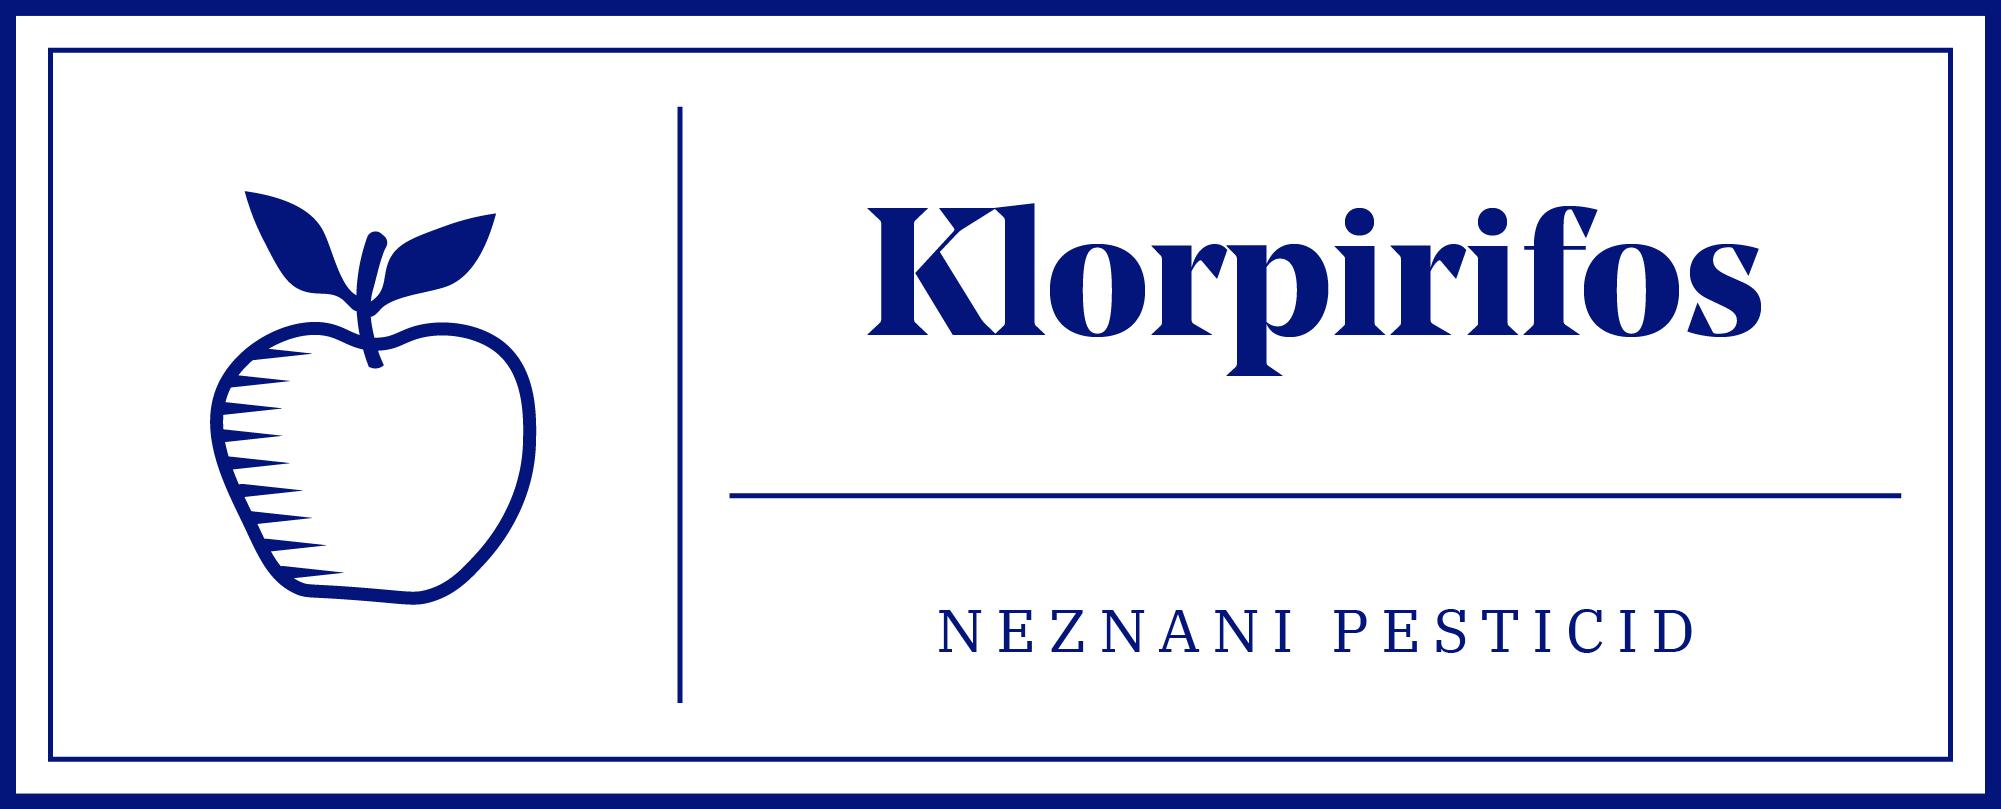 Ostro_Chlorpyrifos_Logo_Slovene.png